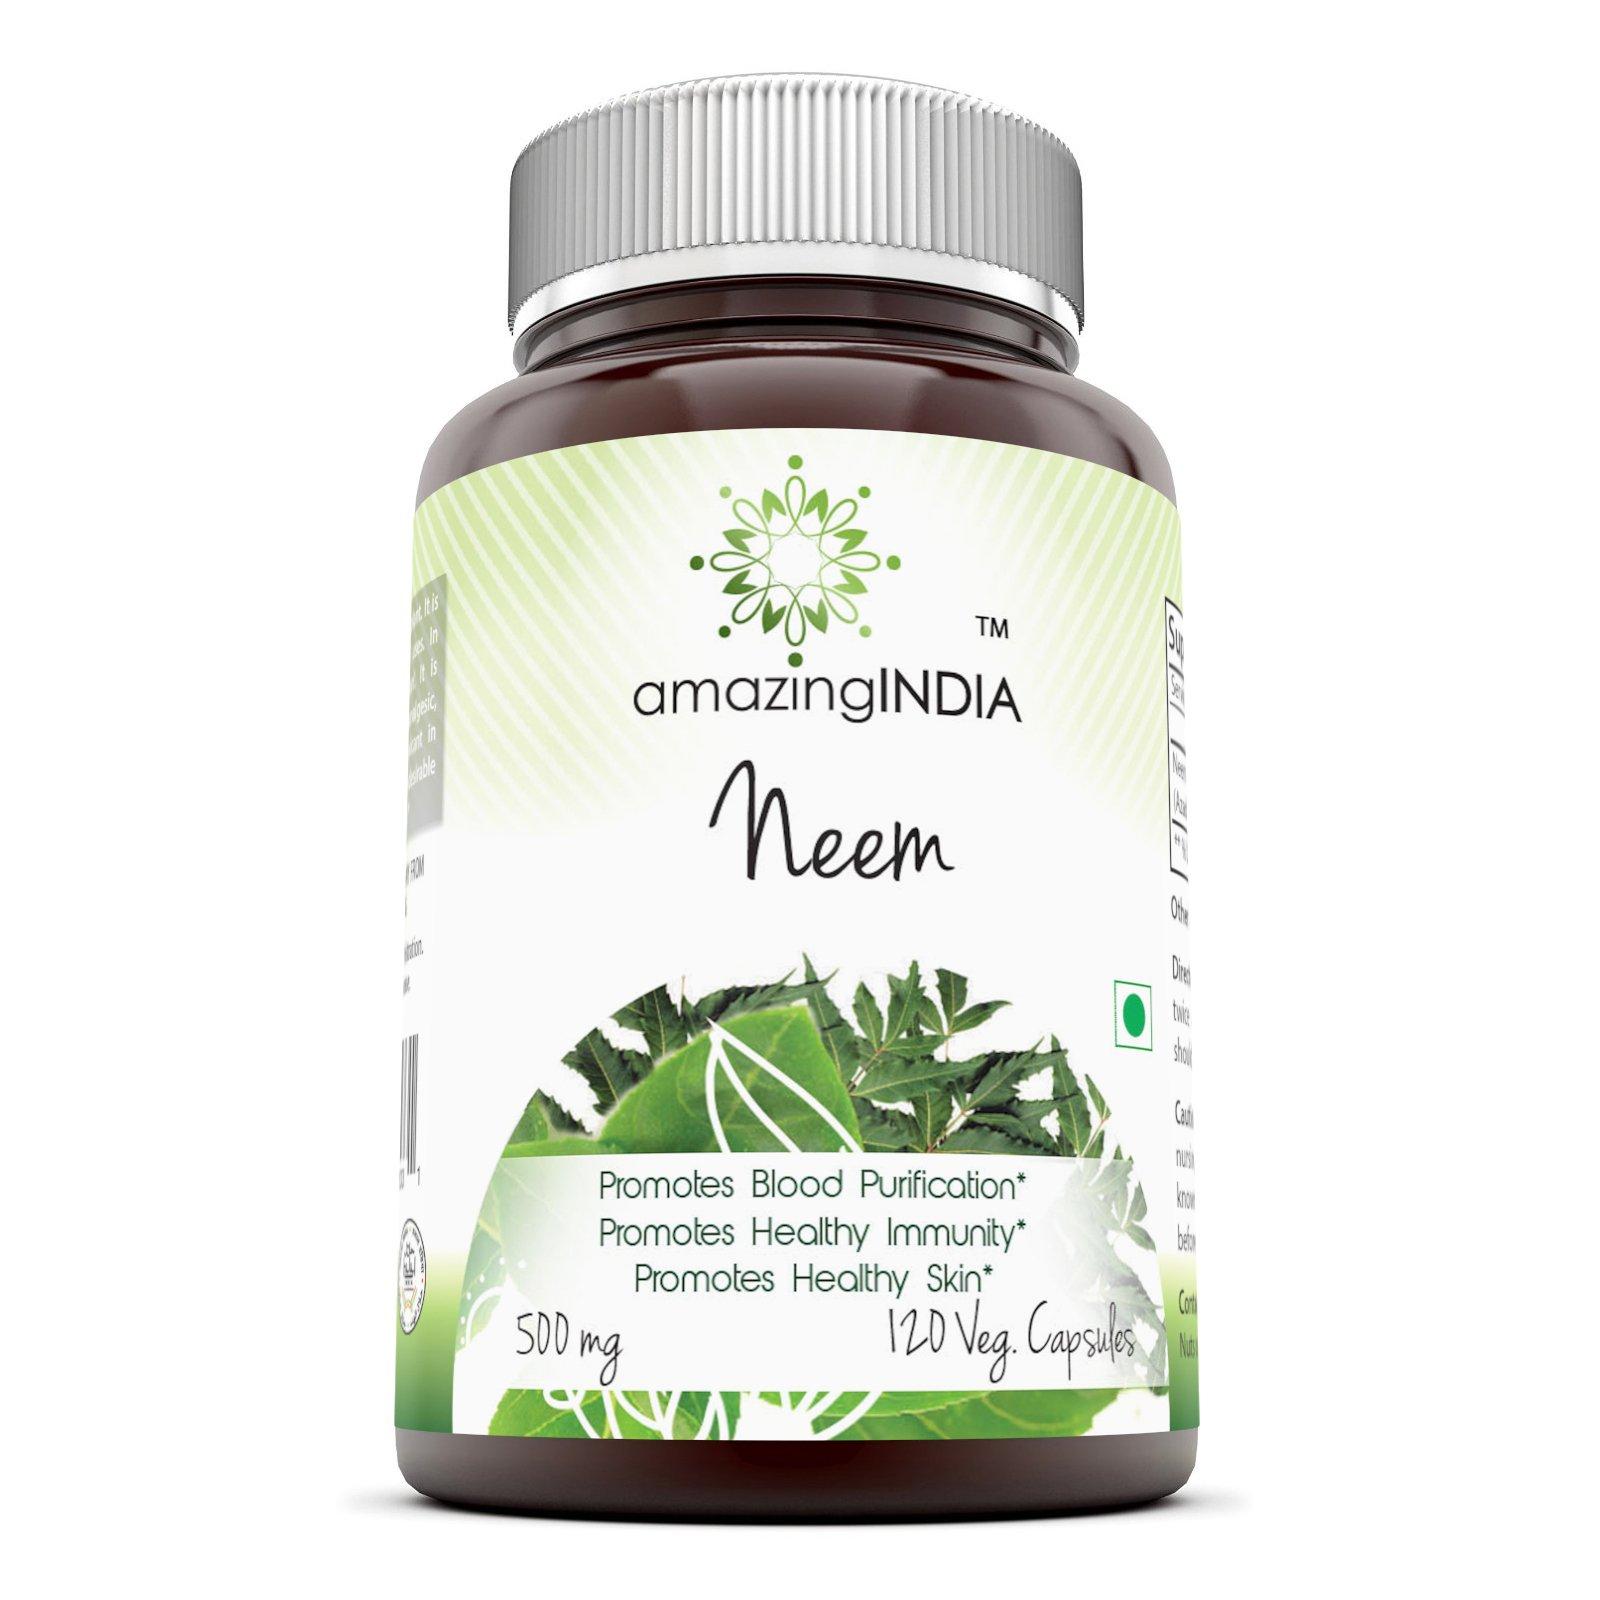 Amazing India Neem 500 Mg 120 Vegetarian Capsules * Promotes Blood Purification , Promotes healthy Immunity and Promotes health Skin *